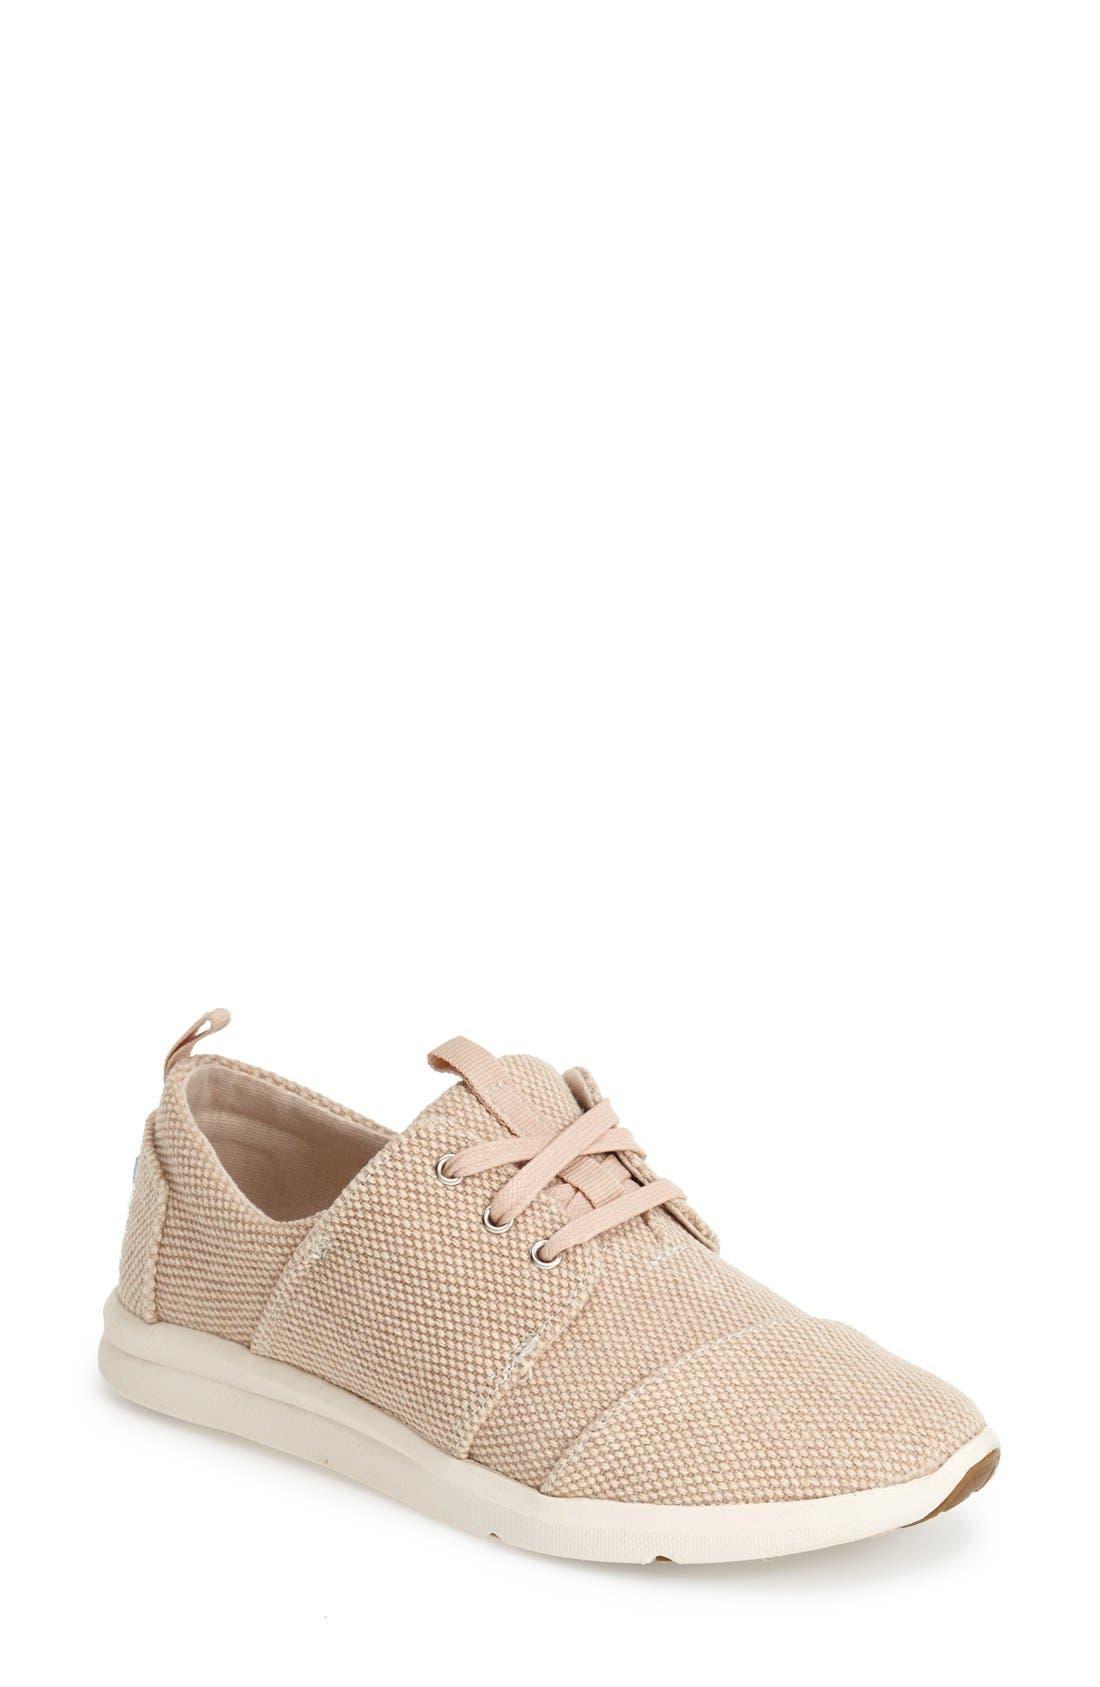 Alternate Image 1 Selected - TOMS 'Del Rey' Sneaker (Women)